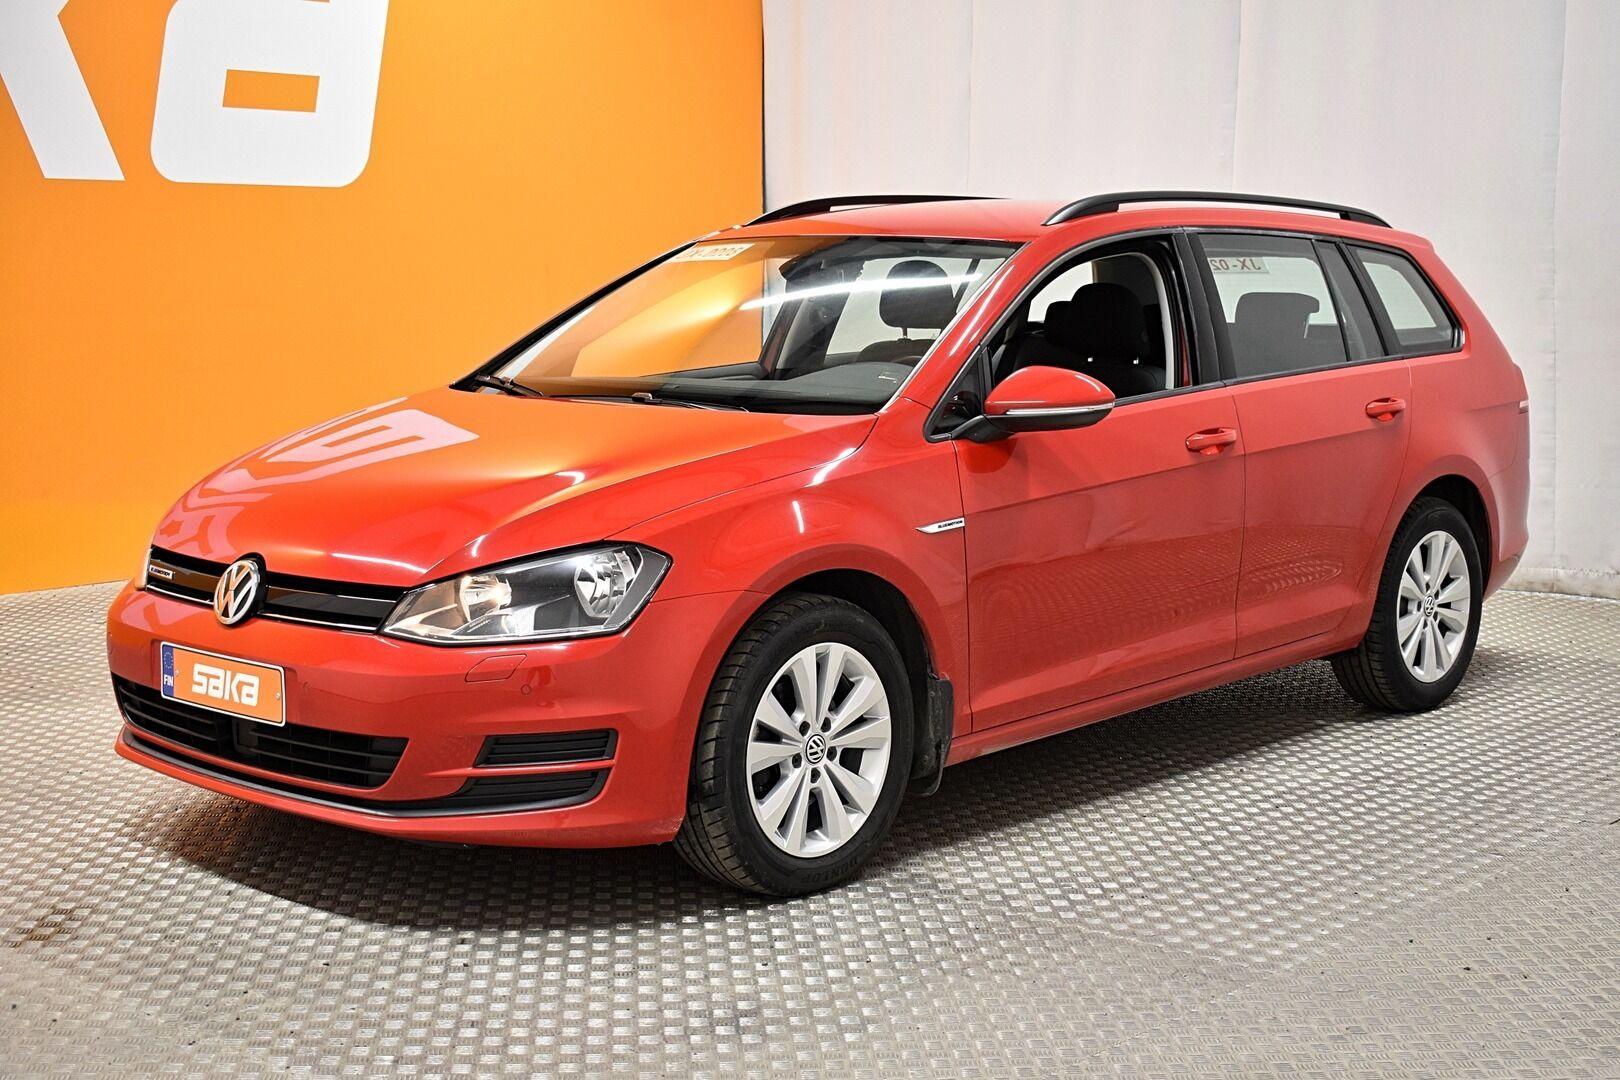 Punainen Farmari, Volkswagen Golf – LEM-79340, kuva 7